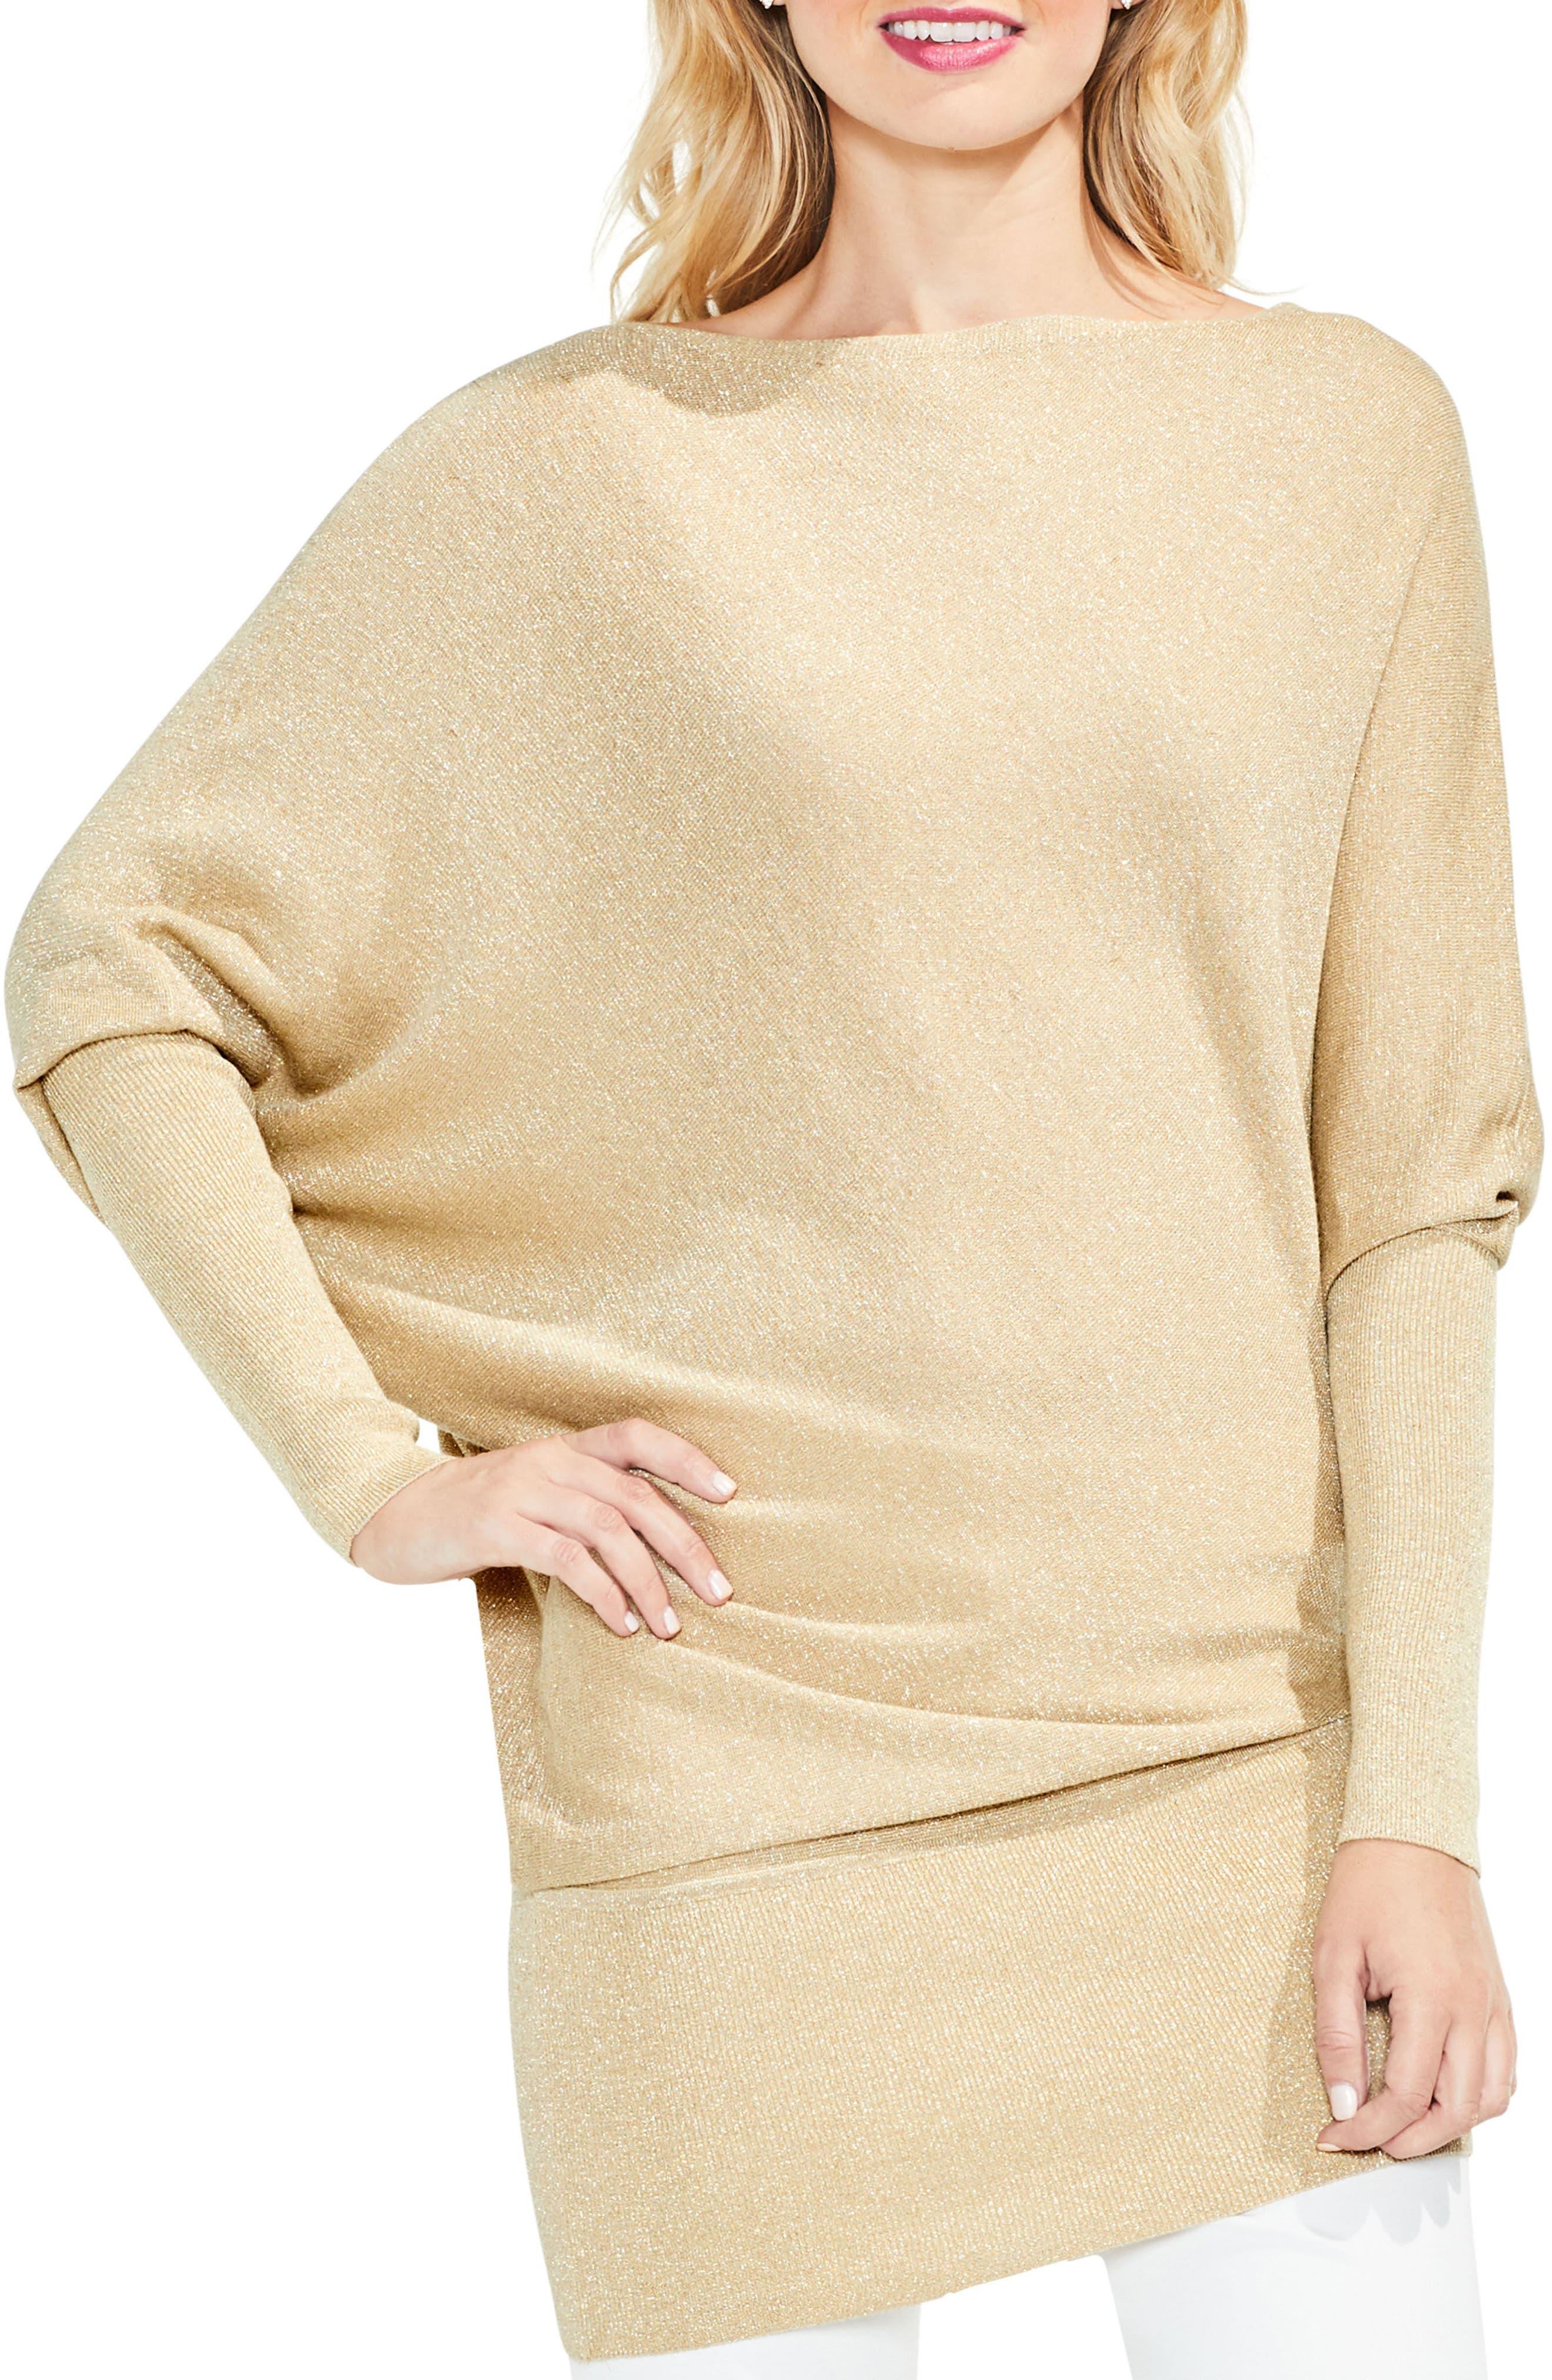 Main Image - Vince Camuto Batwing Sleeve Metallic Sweater